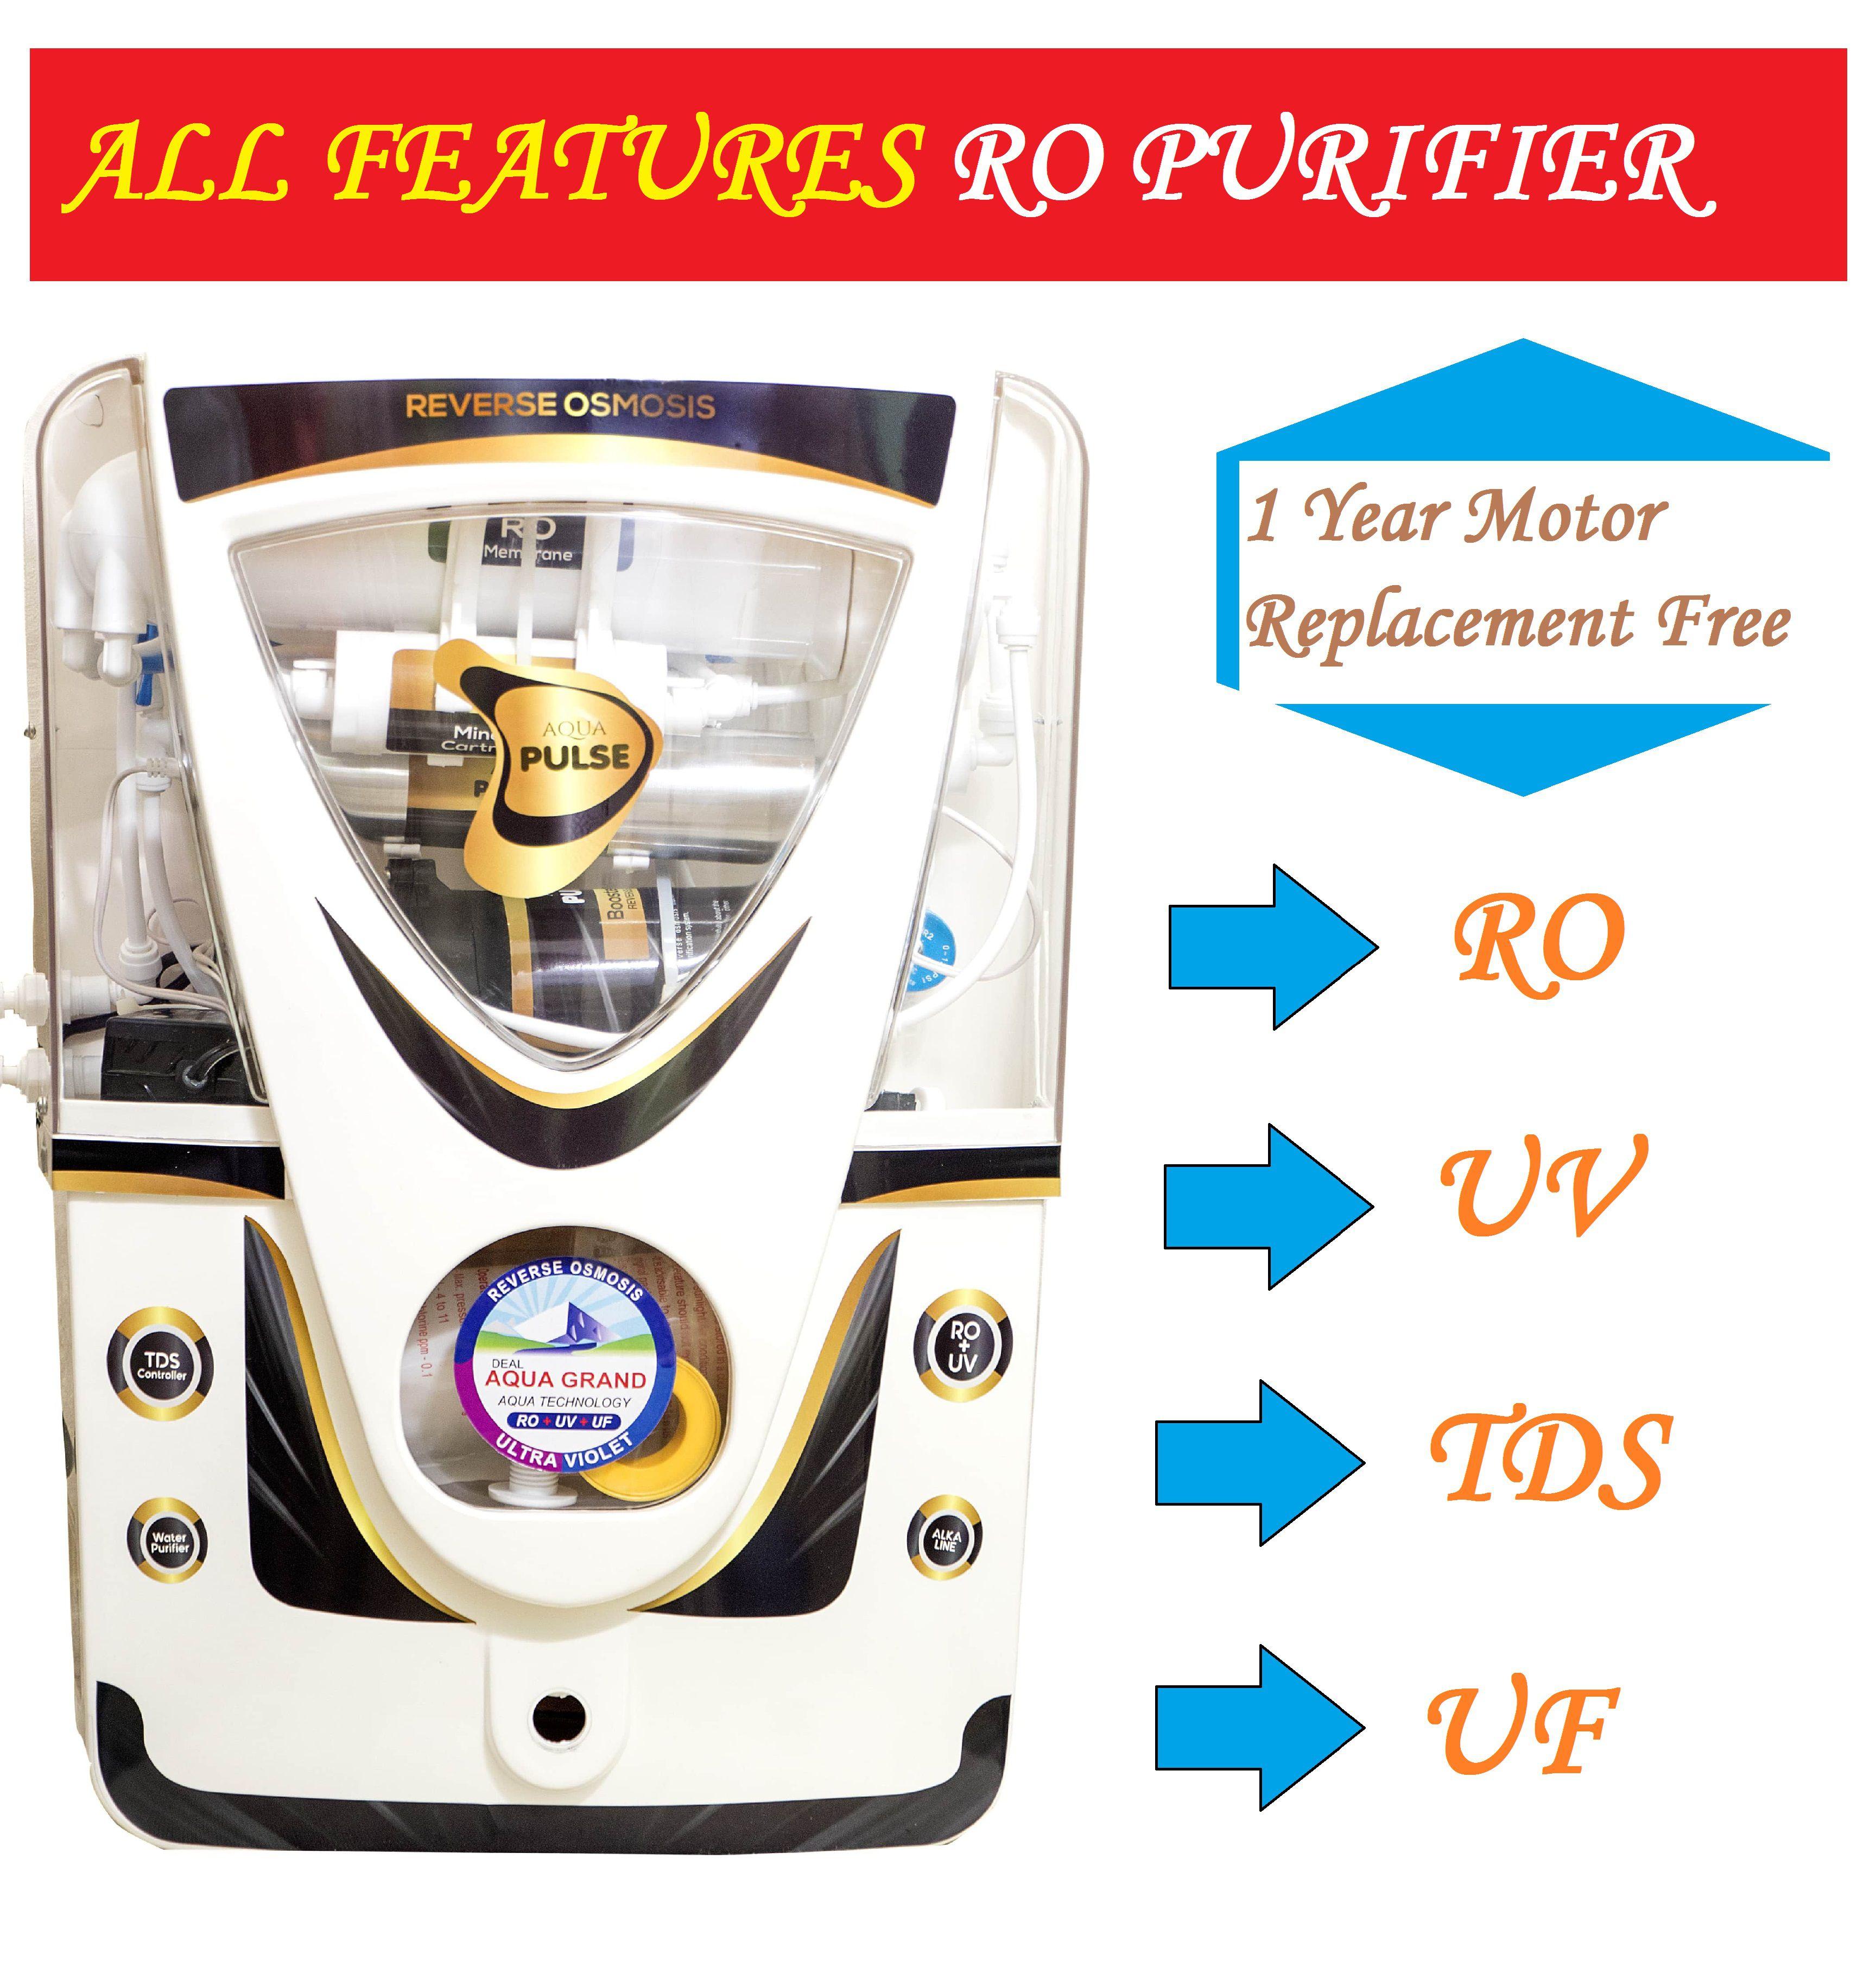 aquagrand deal aqua pulse 12 ltr rouvuf water purifier all features